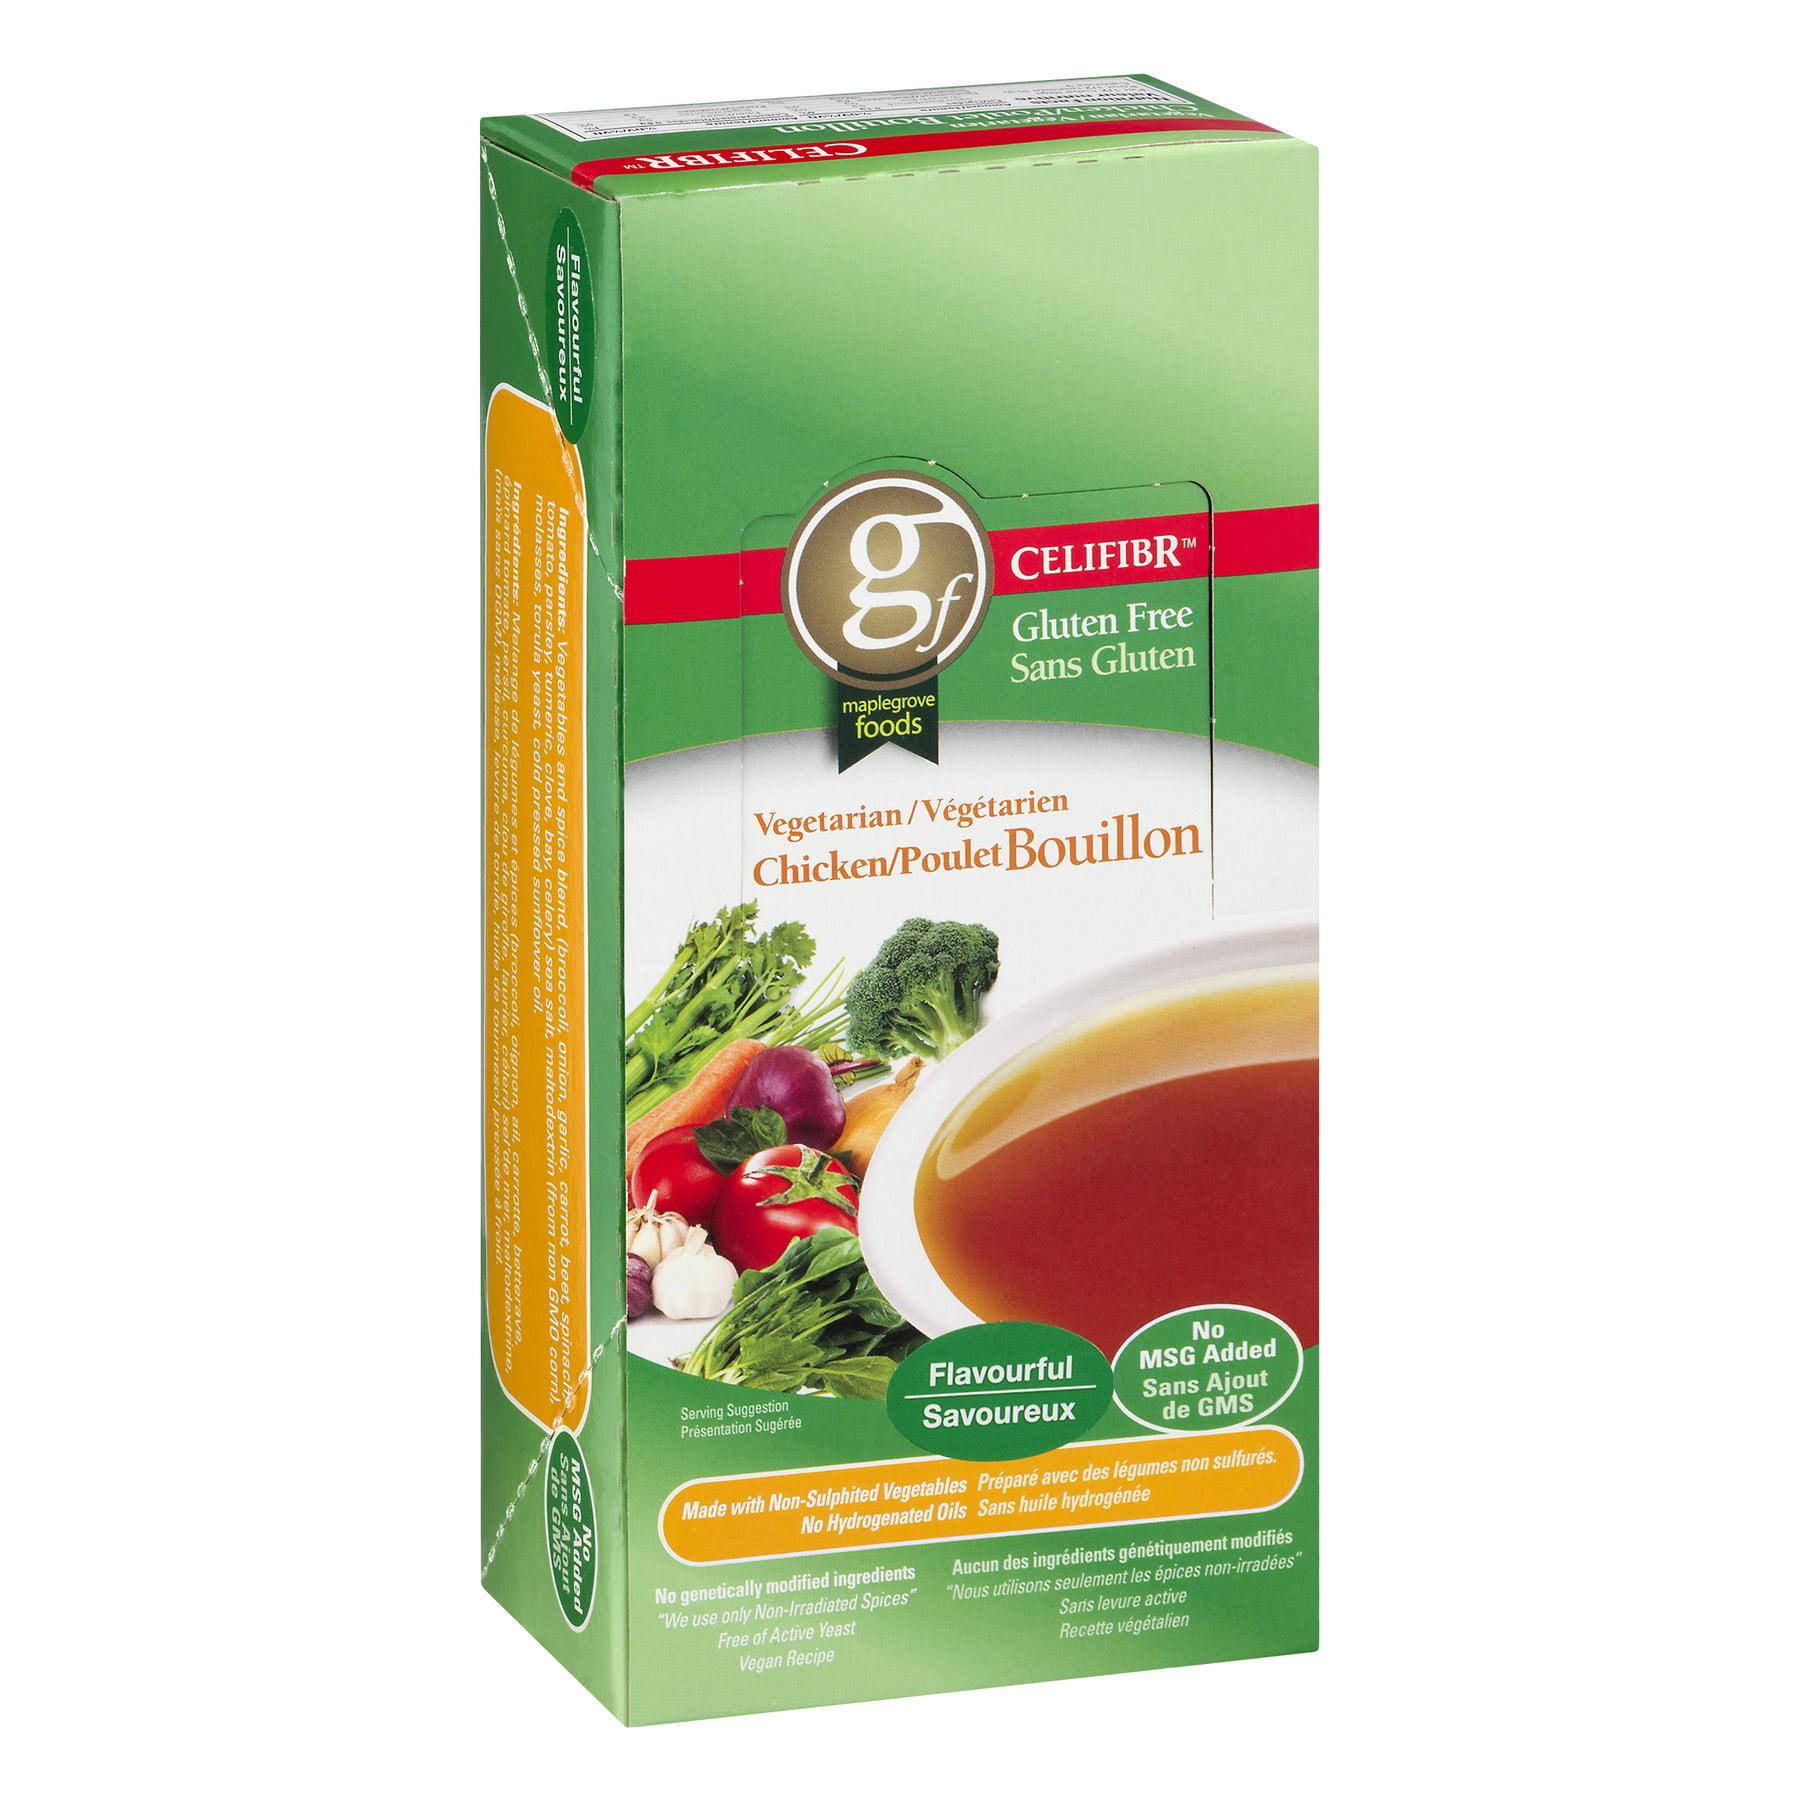 Celifibr Gluten Free Vegetarian Bouillon Soup Chicken 2 Ounce